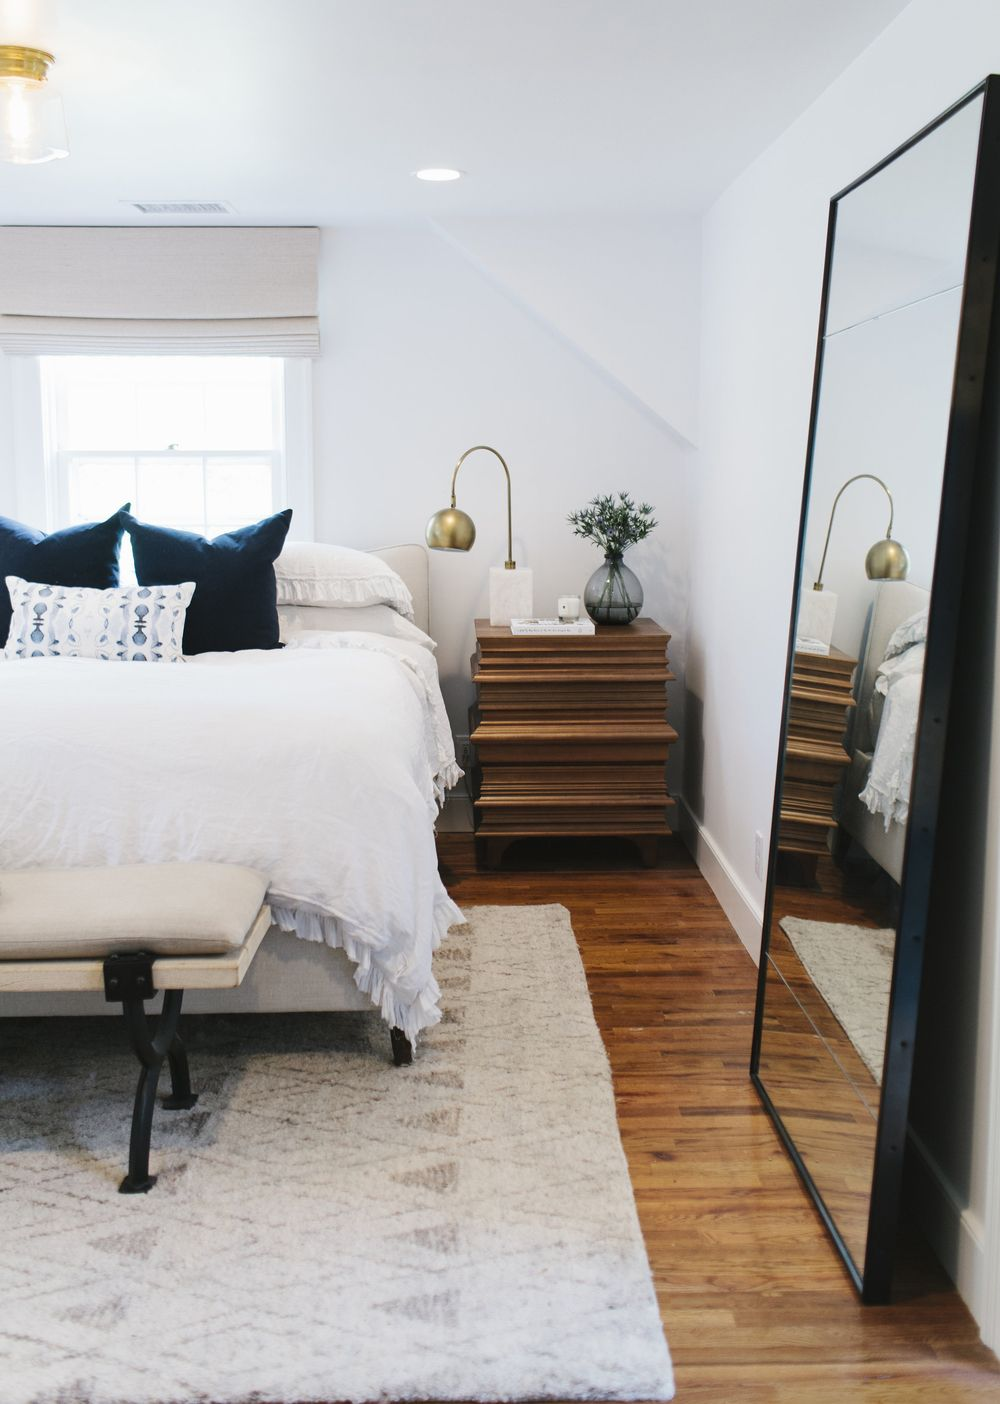 grote spiegel op vloer slaapkamer